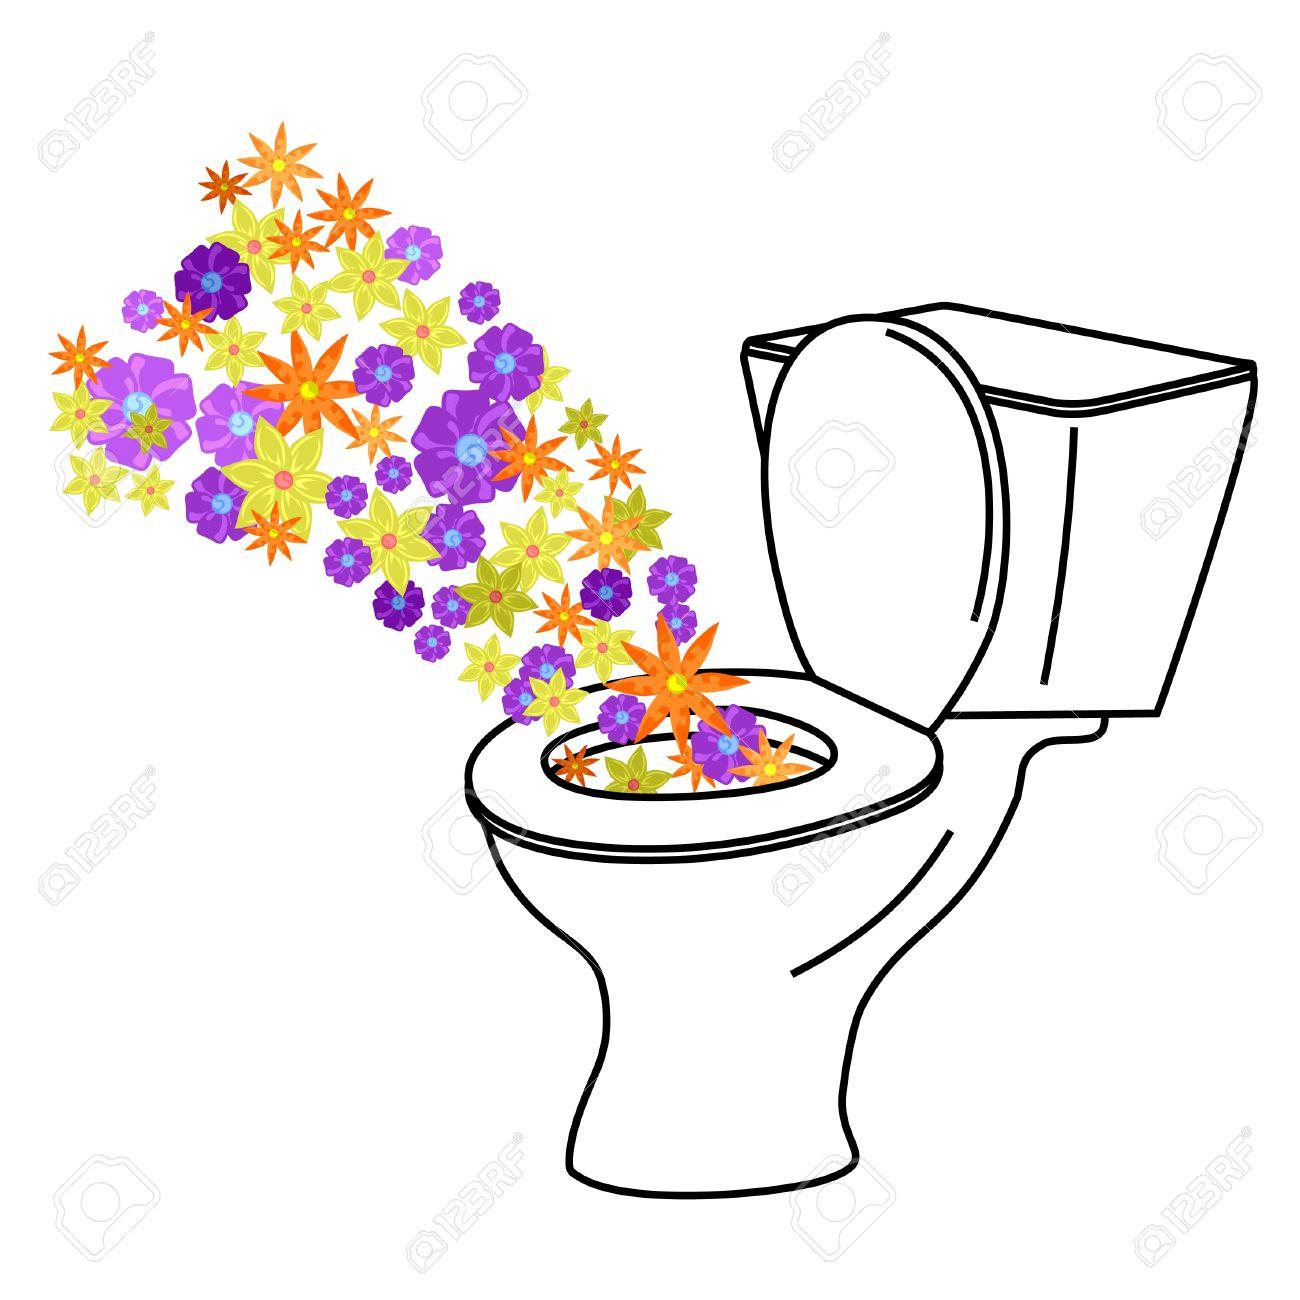 Representation Of A Urinal Clean Stock Vector